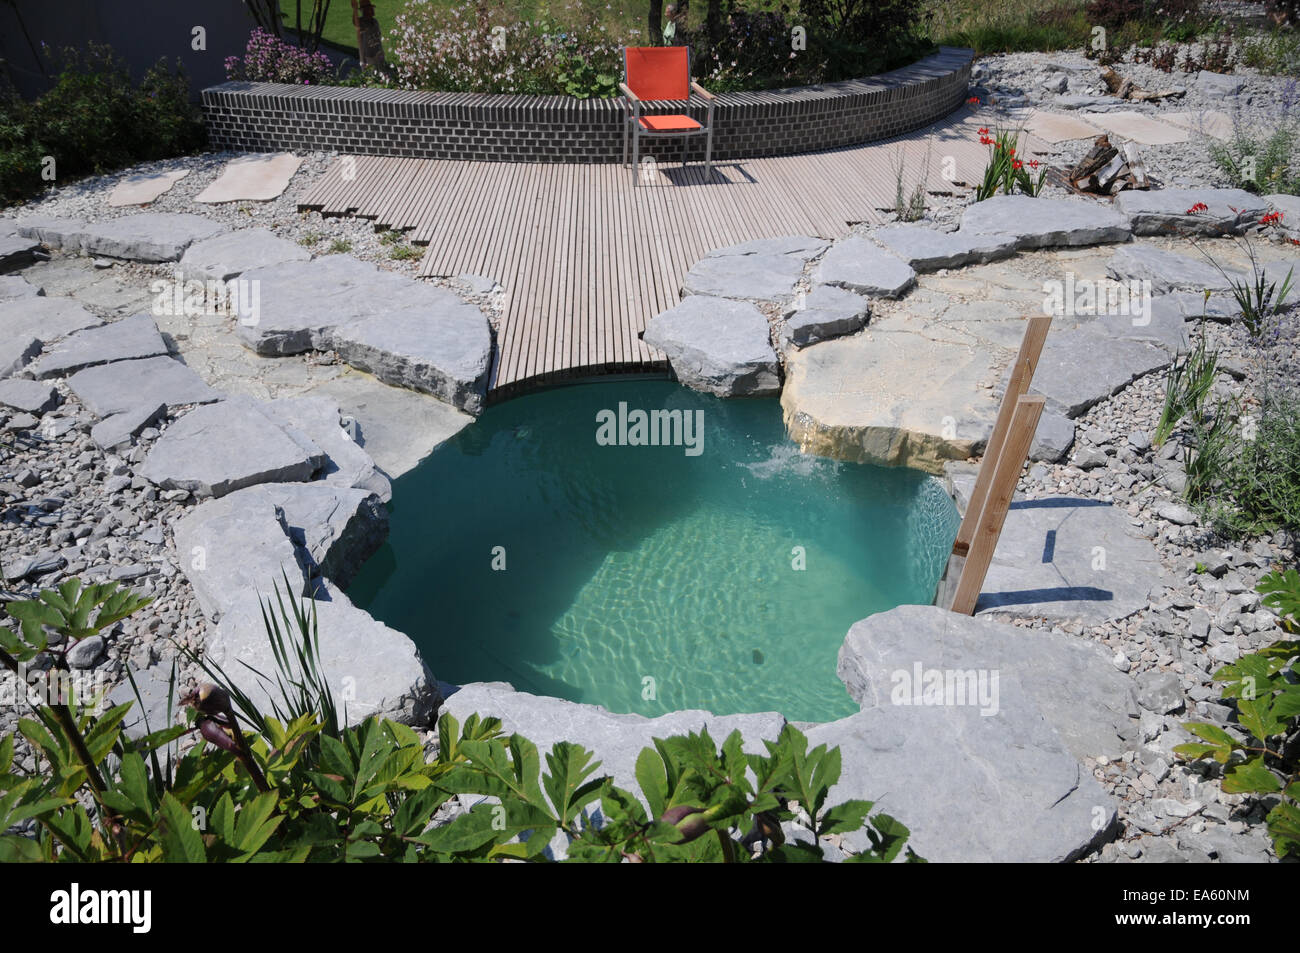 Natur-pool - Stock Image